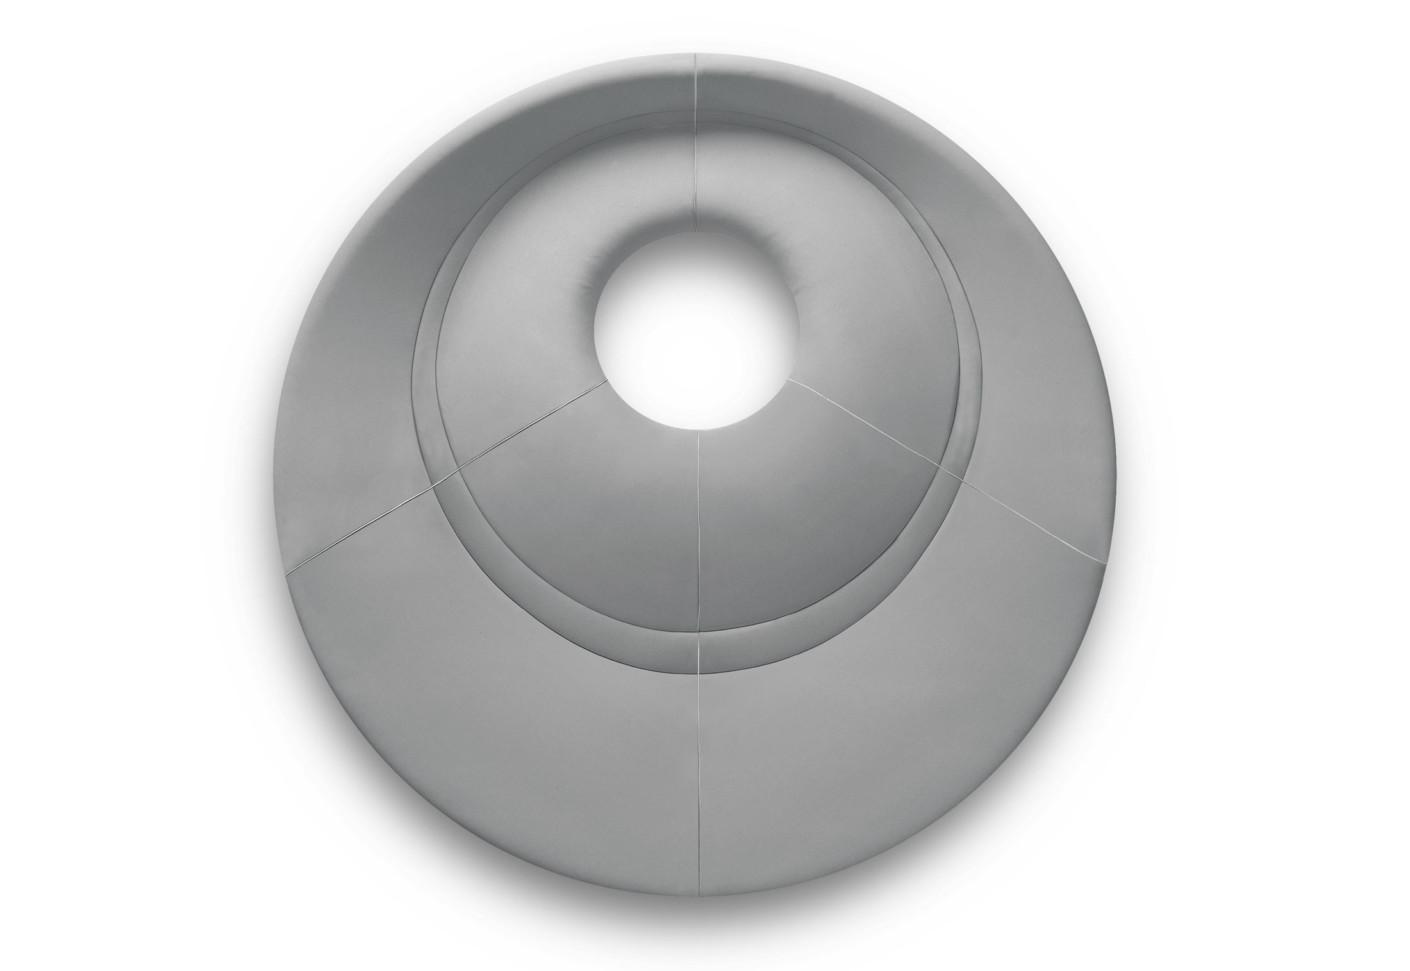 Walter Knoll Circle Sofa Dimensions Refil Sofa